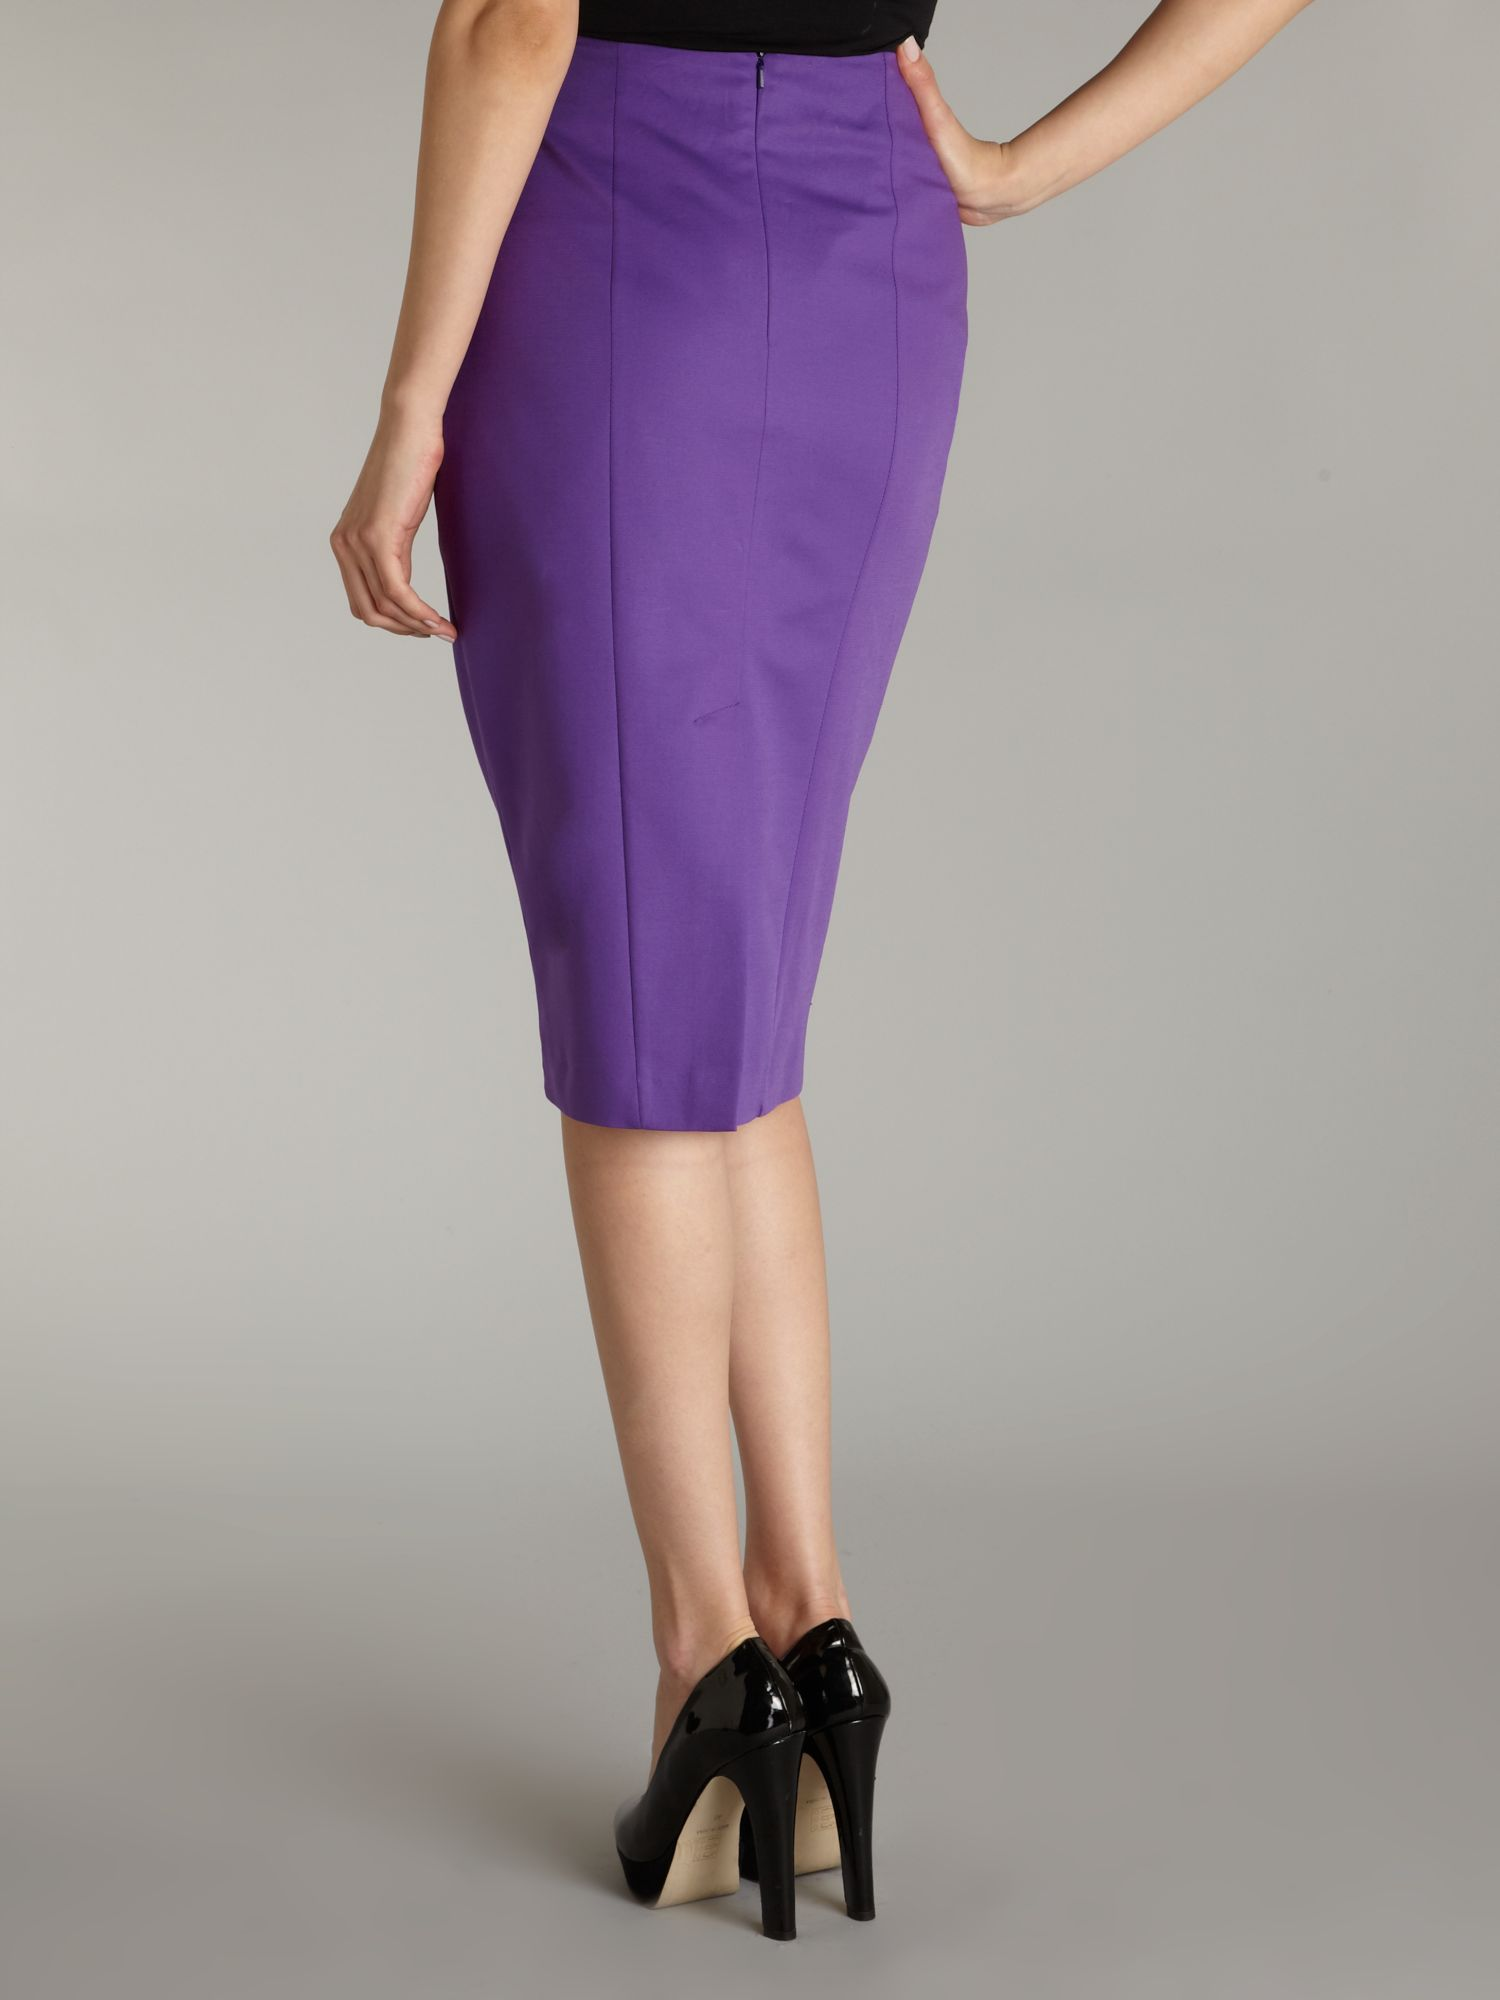 Kenneth cole Midi Pencil Skirt in Purple | Lyst